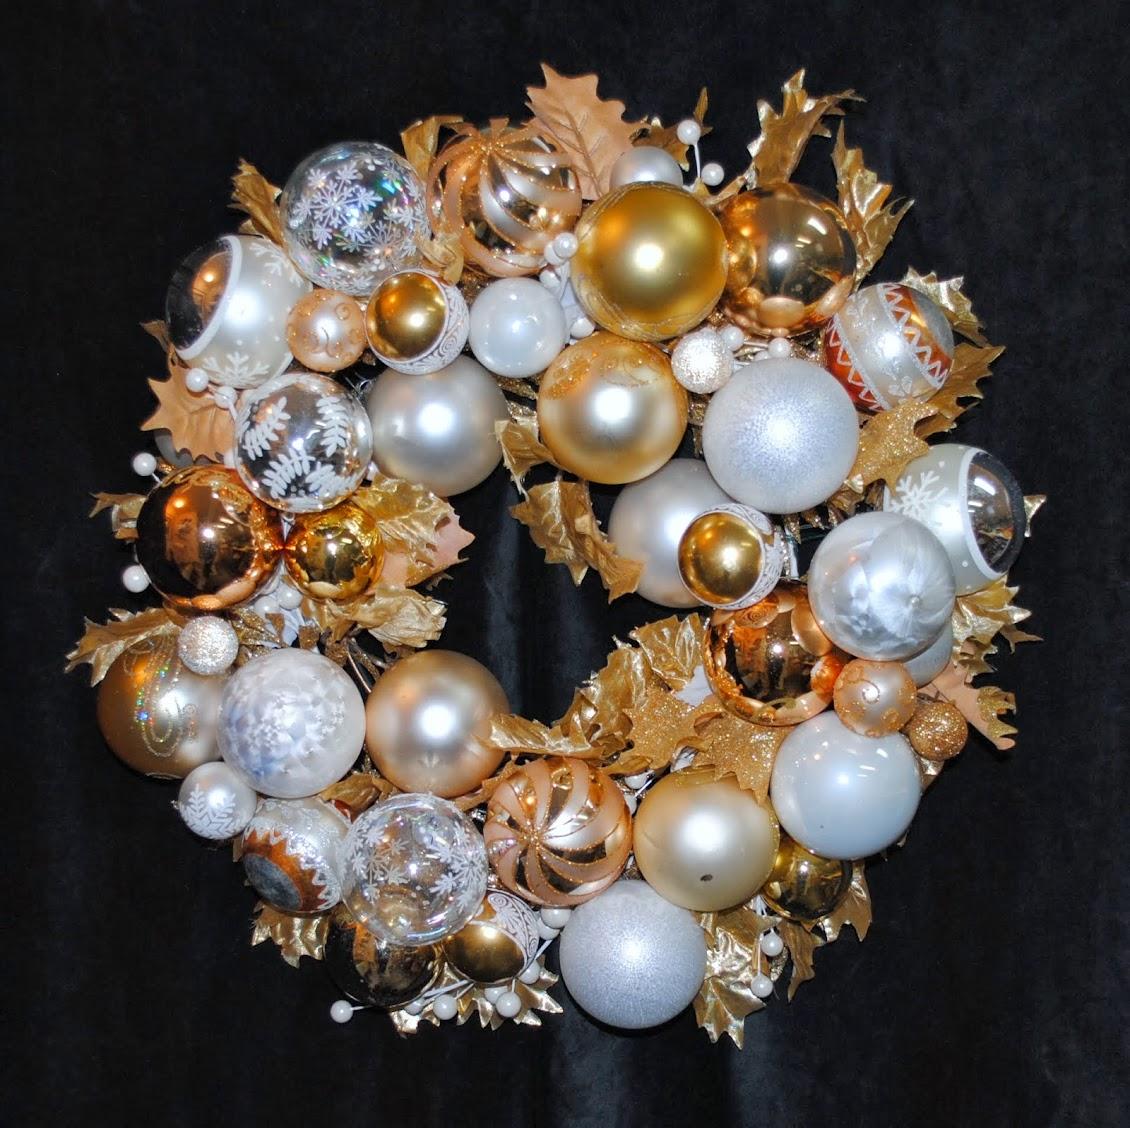 Peace & Joy Christmas Ornament Centerpiece OWR8036